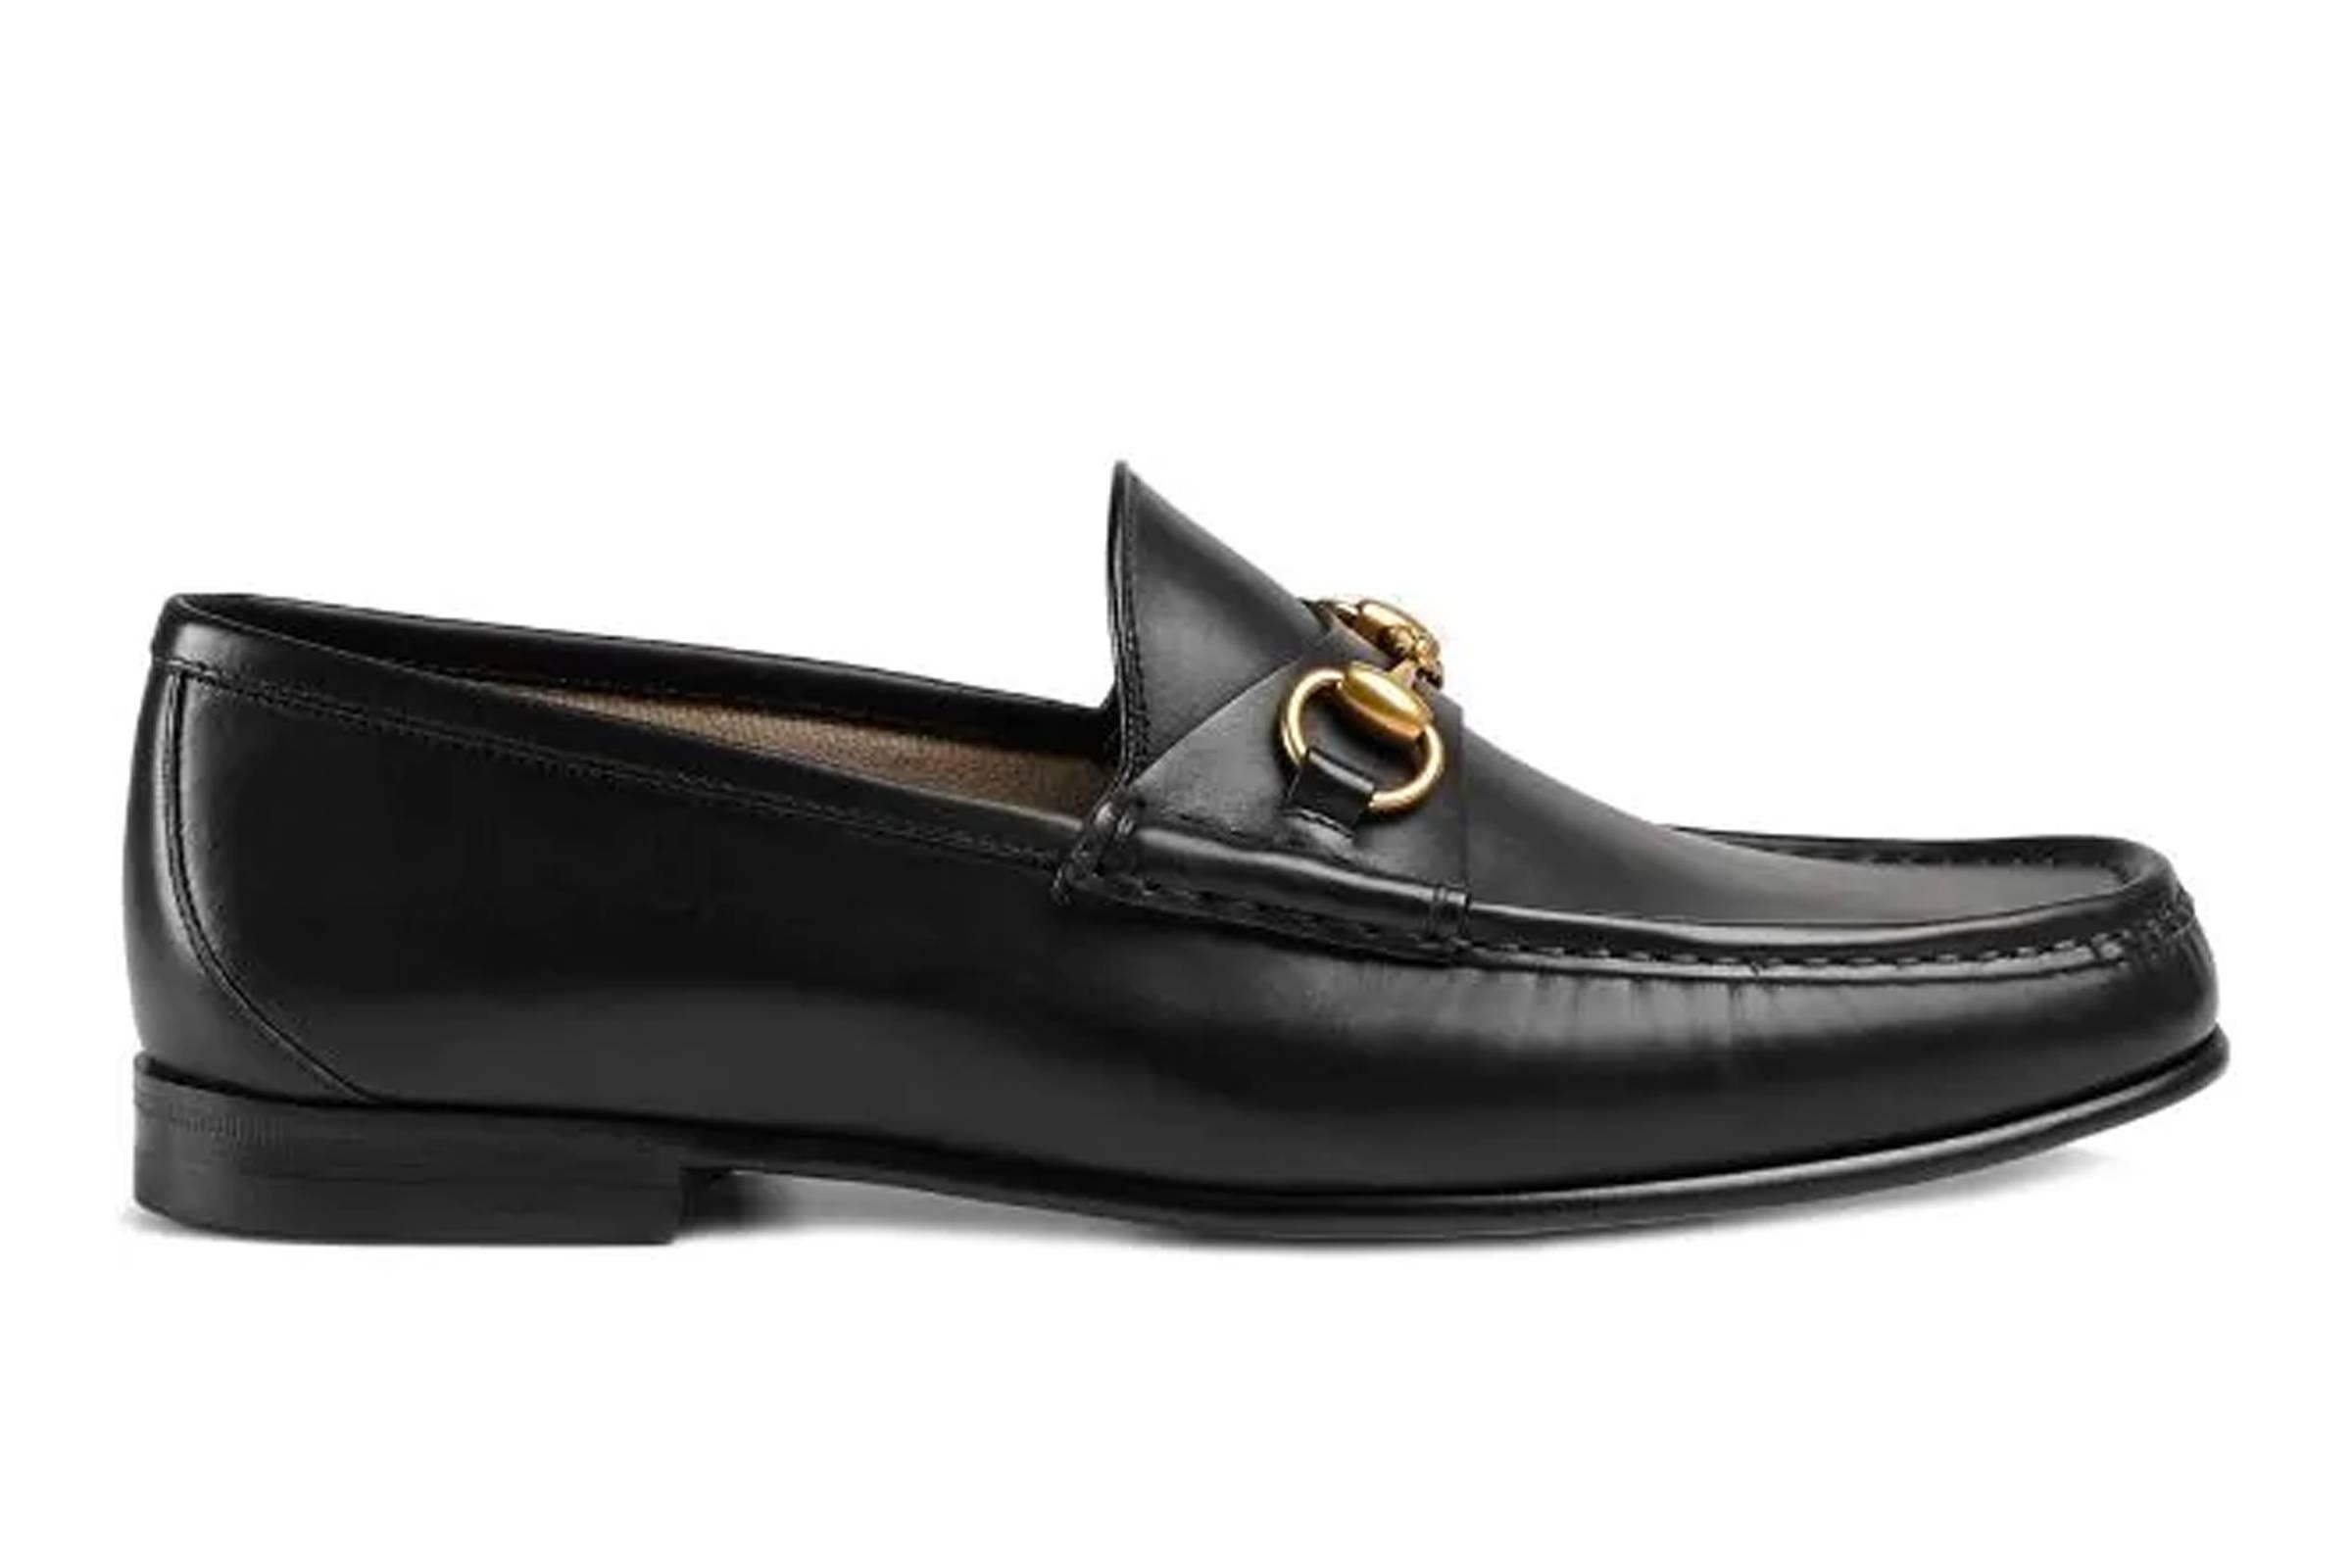 Gucci 1953 Horsebit Loafer